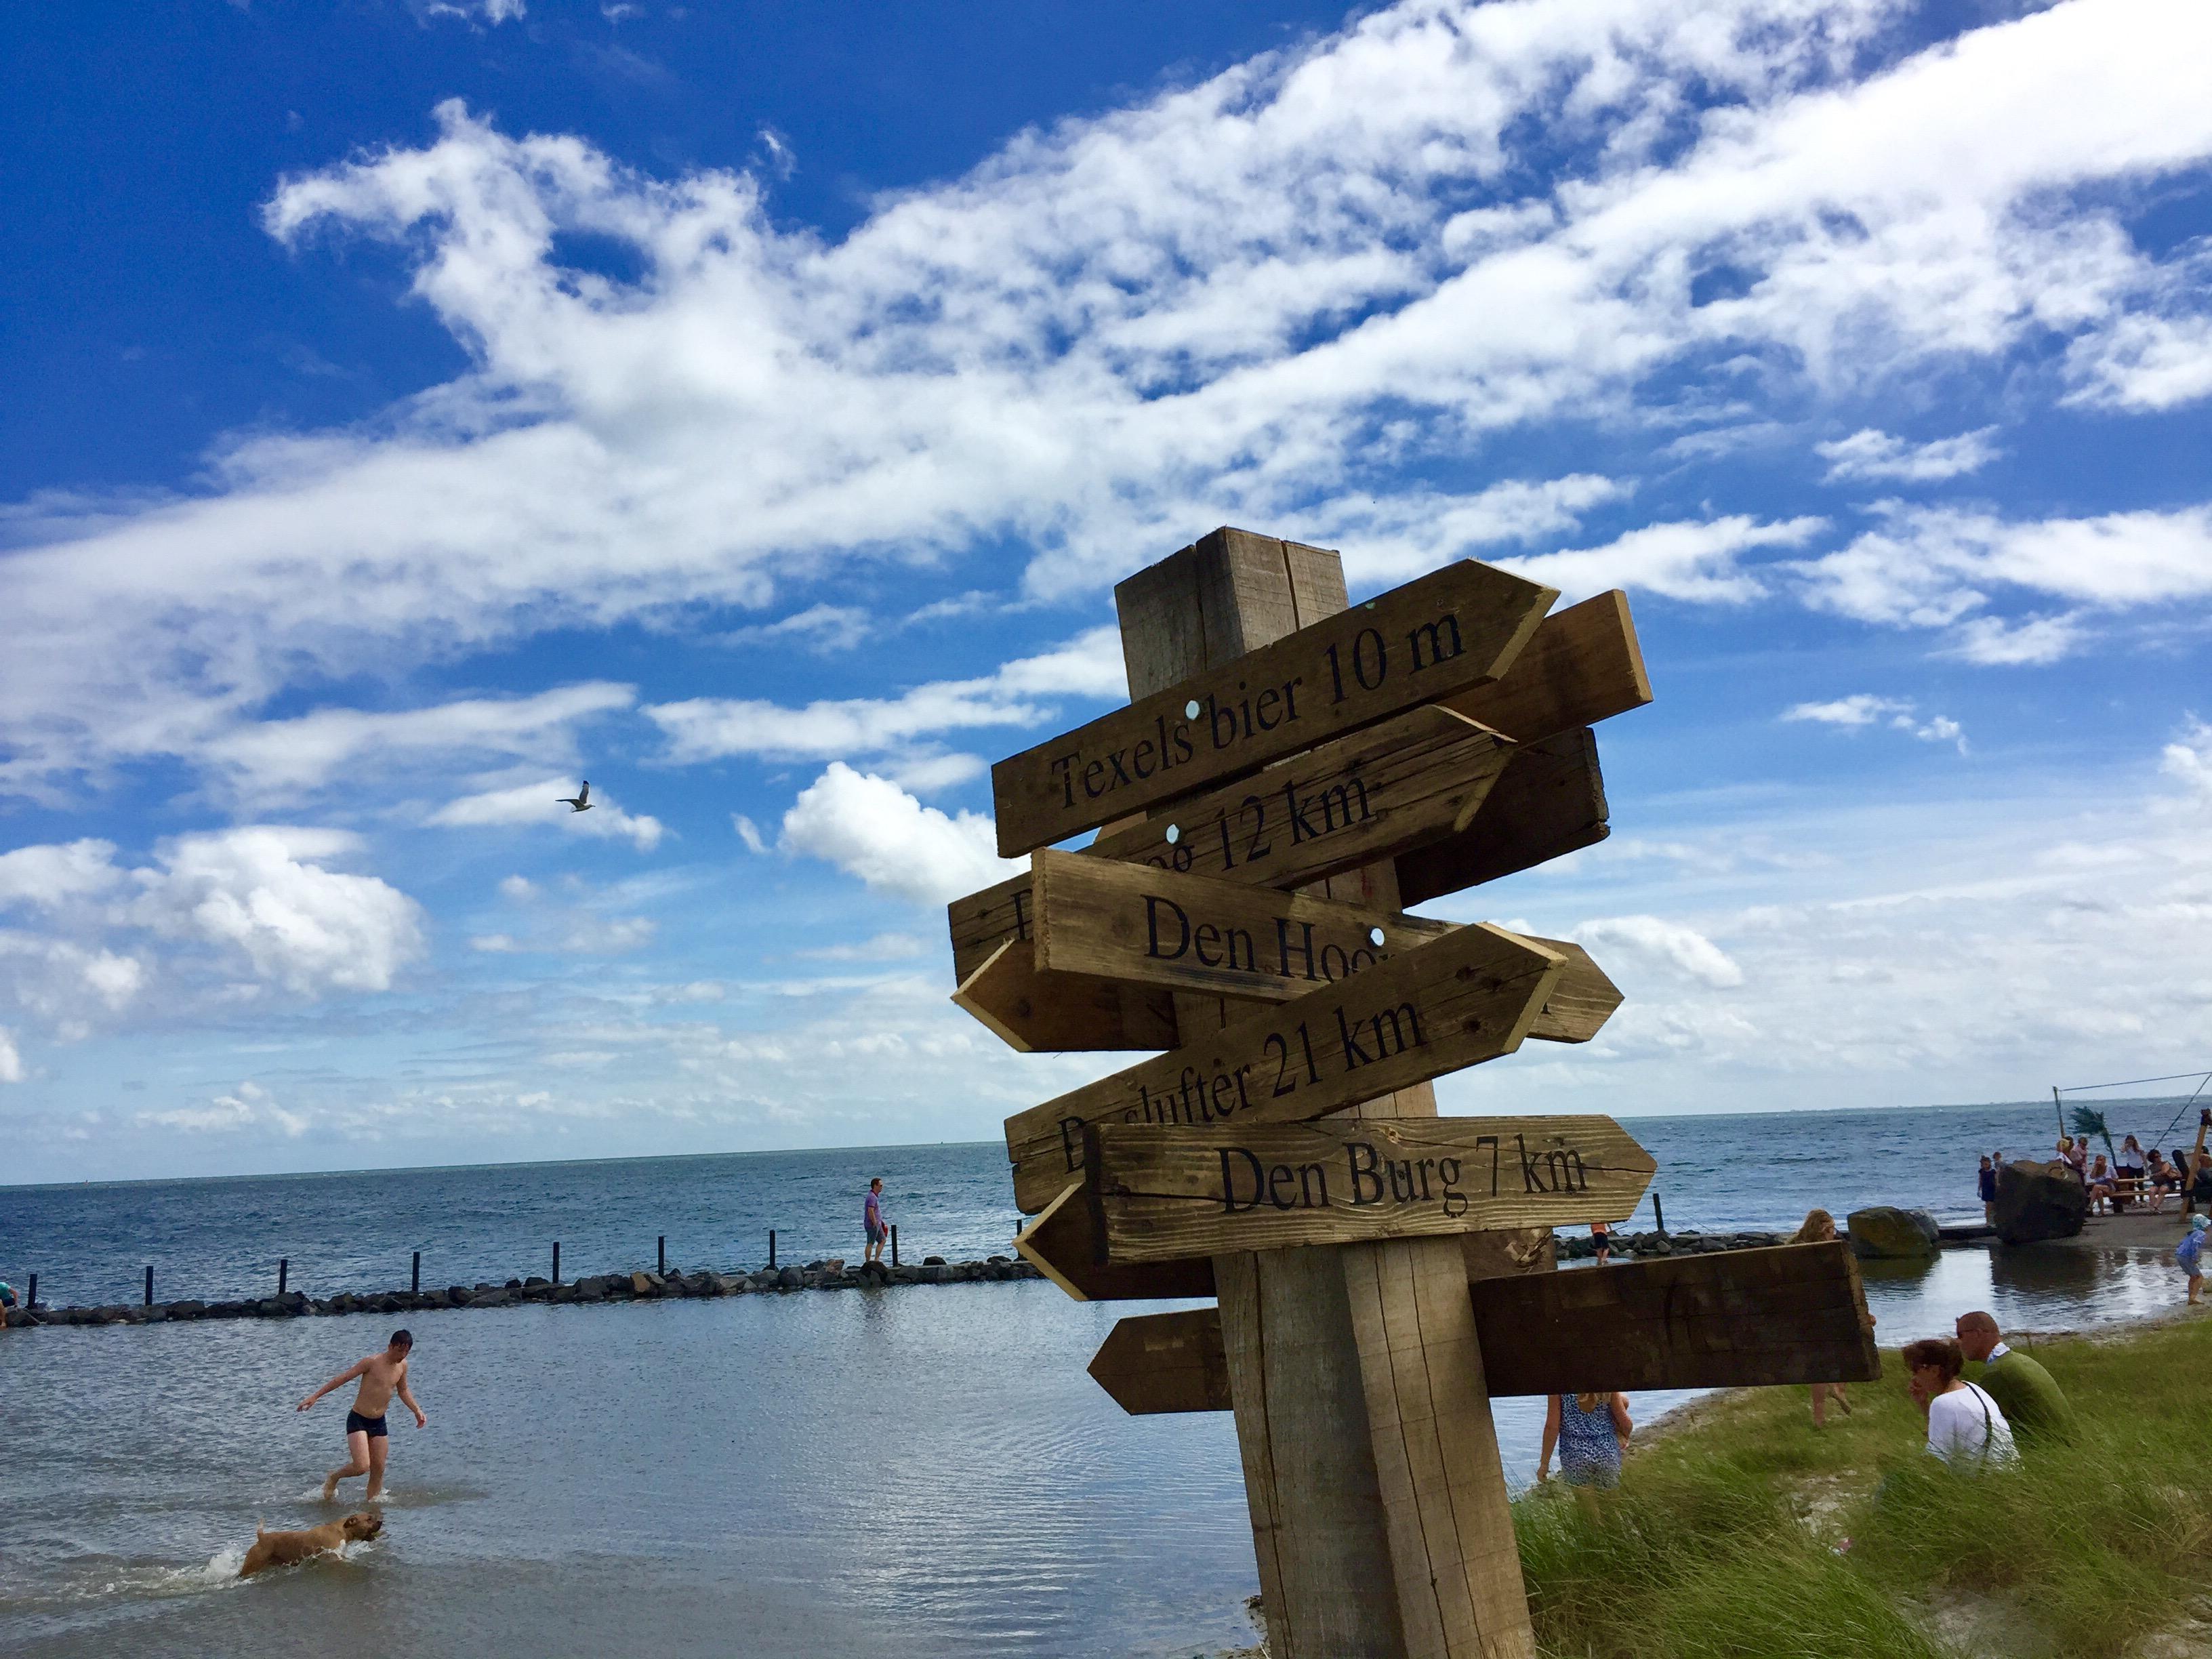 Texel beach festival